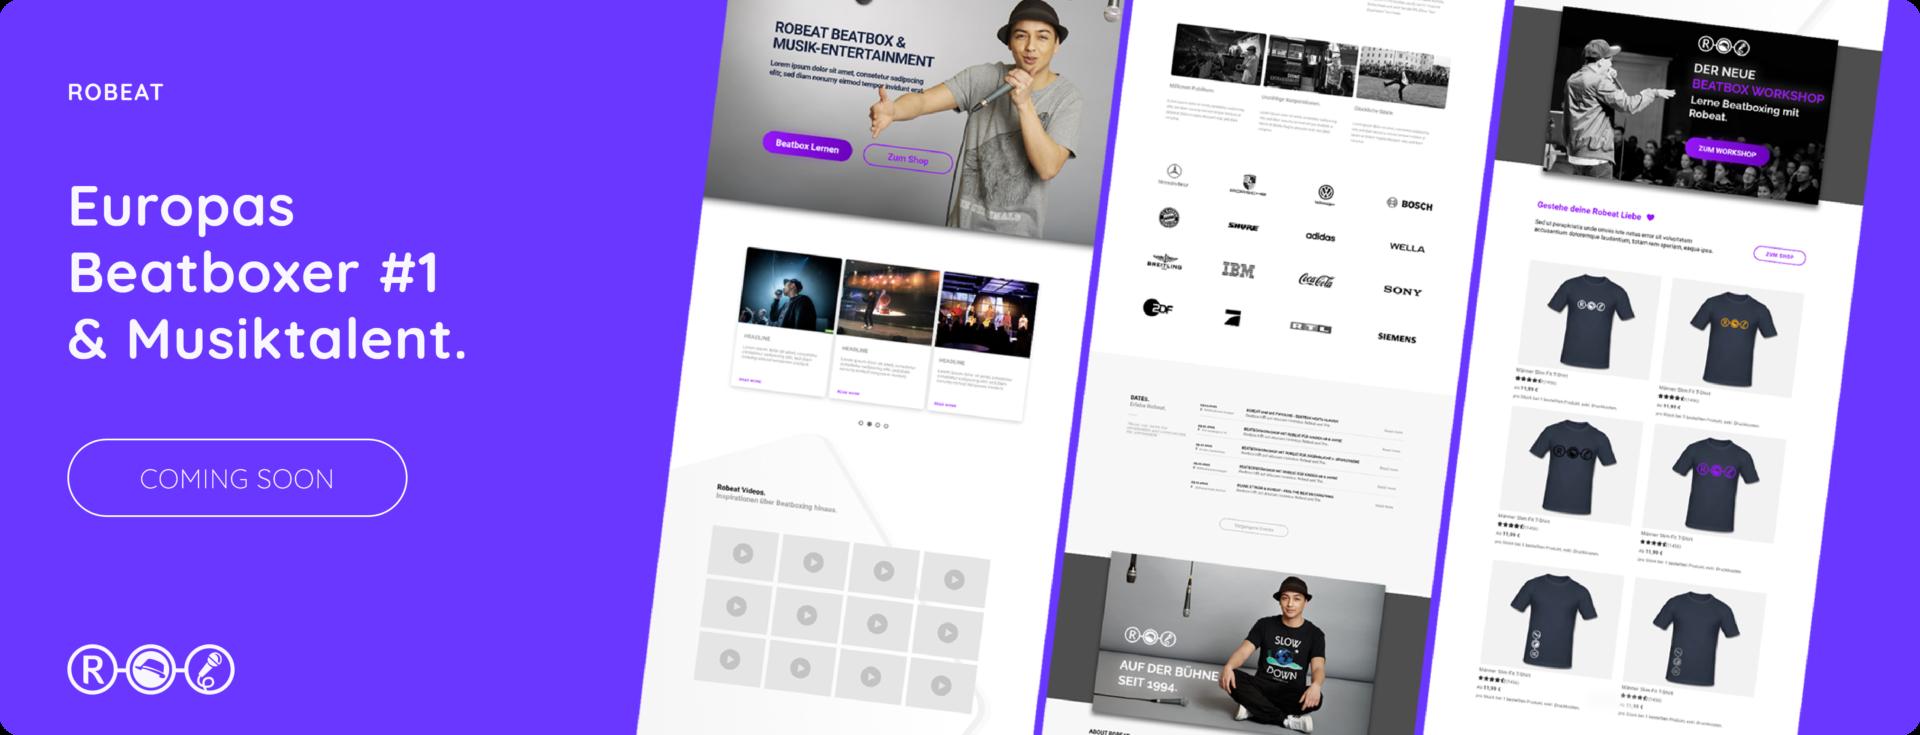 Coming soon - neue Webseite Robeat